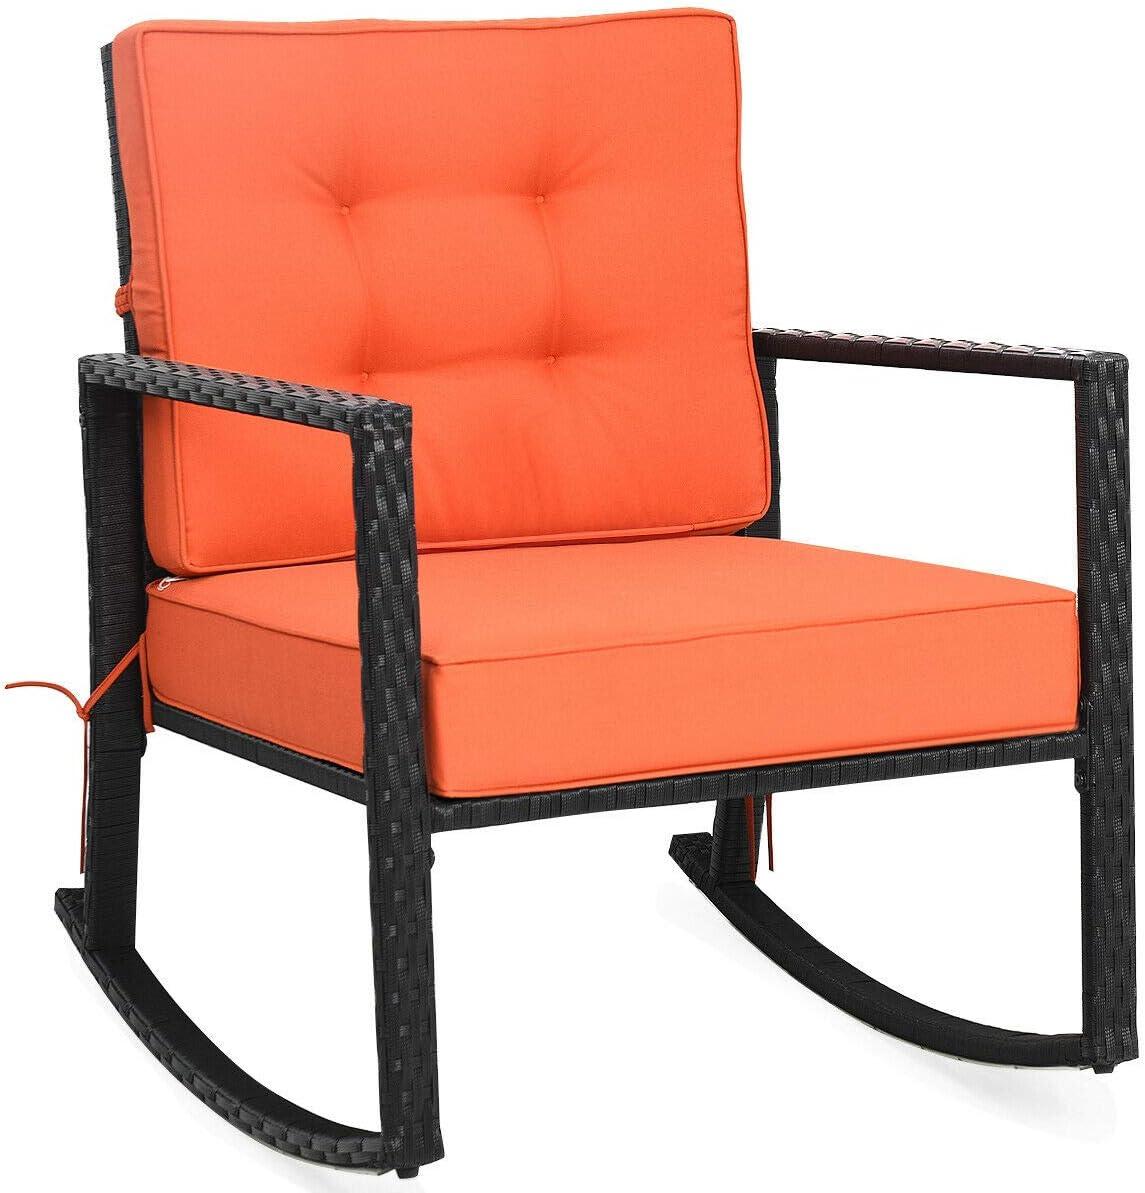 Orange Soft Cushion Patio Same day shipping Rattan Max 73% OFF A Chair Armchair Rocking Rocker